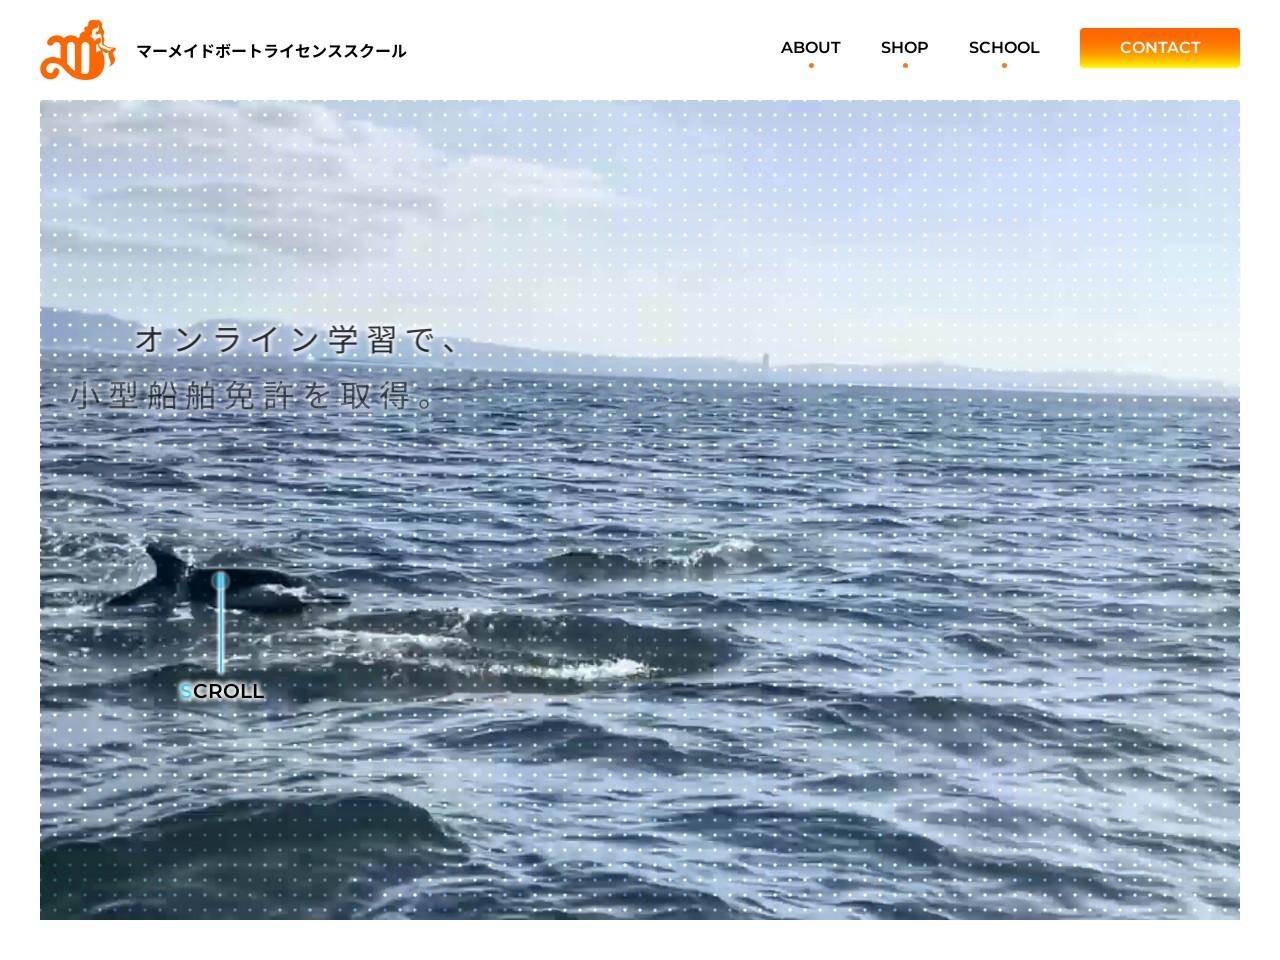 Mermaidボートスクール